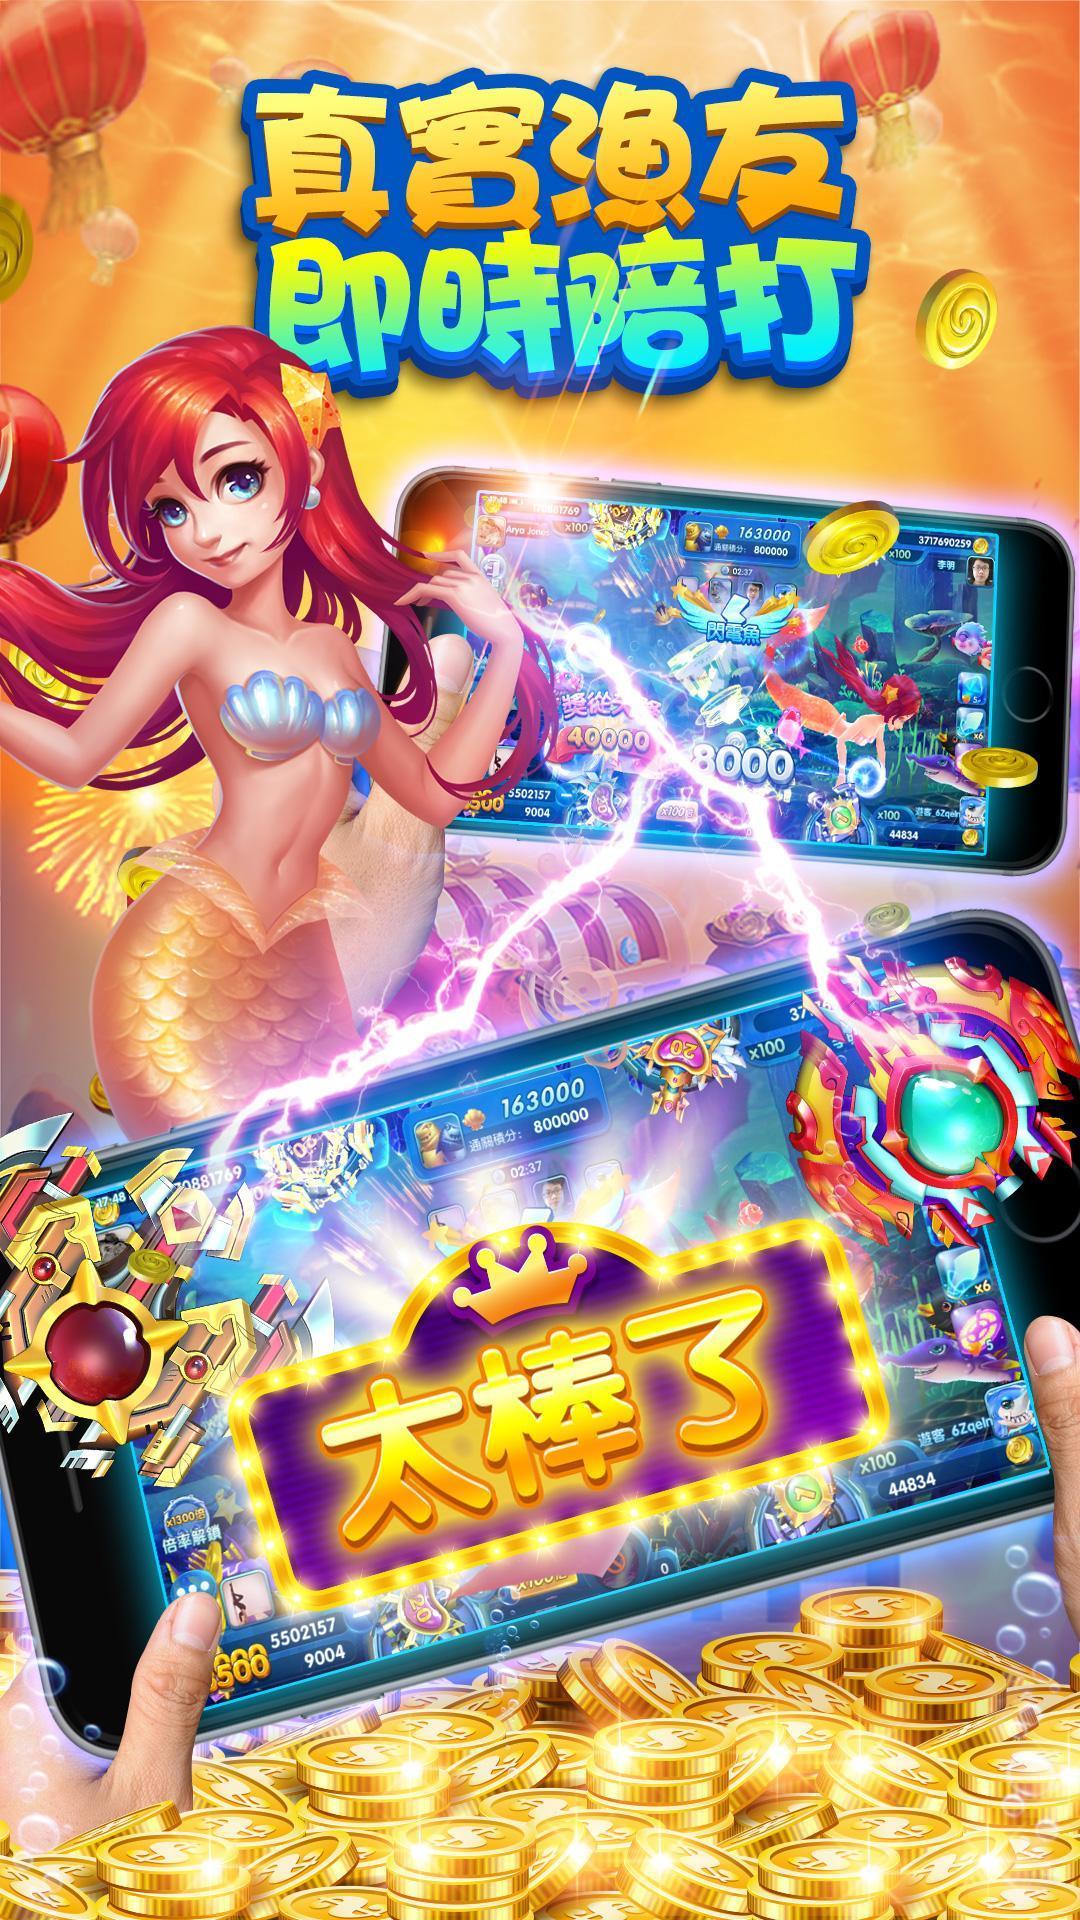 Fish is Coming: Best 3D Arcade 1.16.2 Screenshot 15